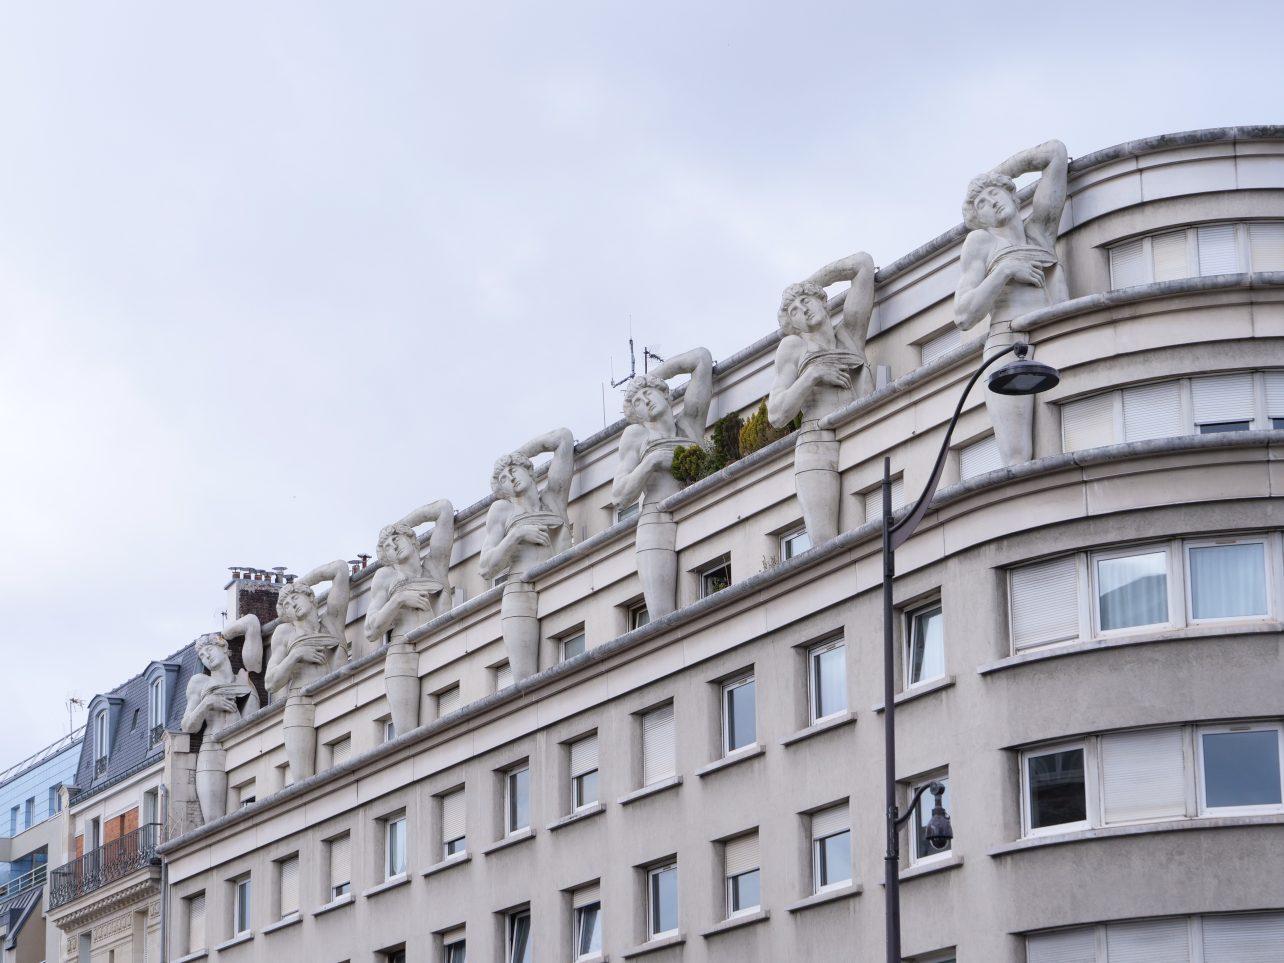 La façade du commissariat de Police de l'avenue Daumesnil